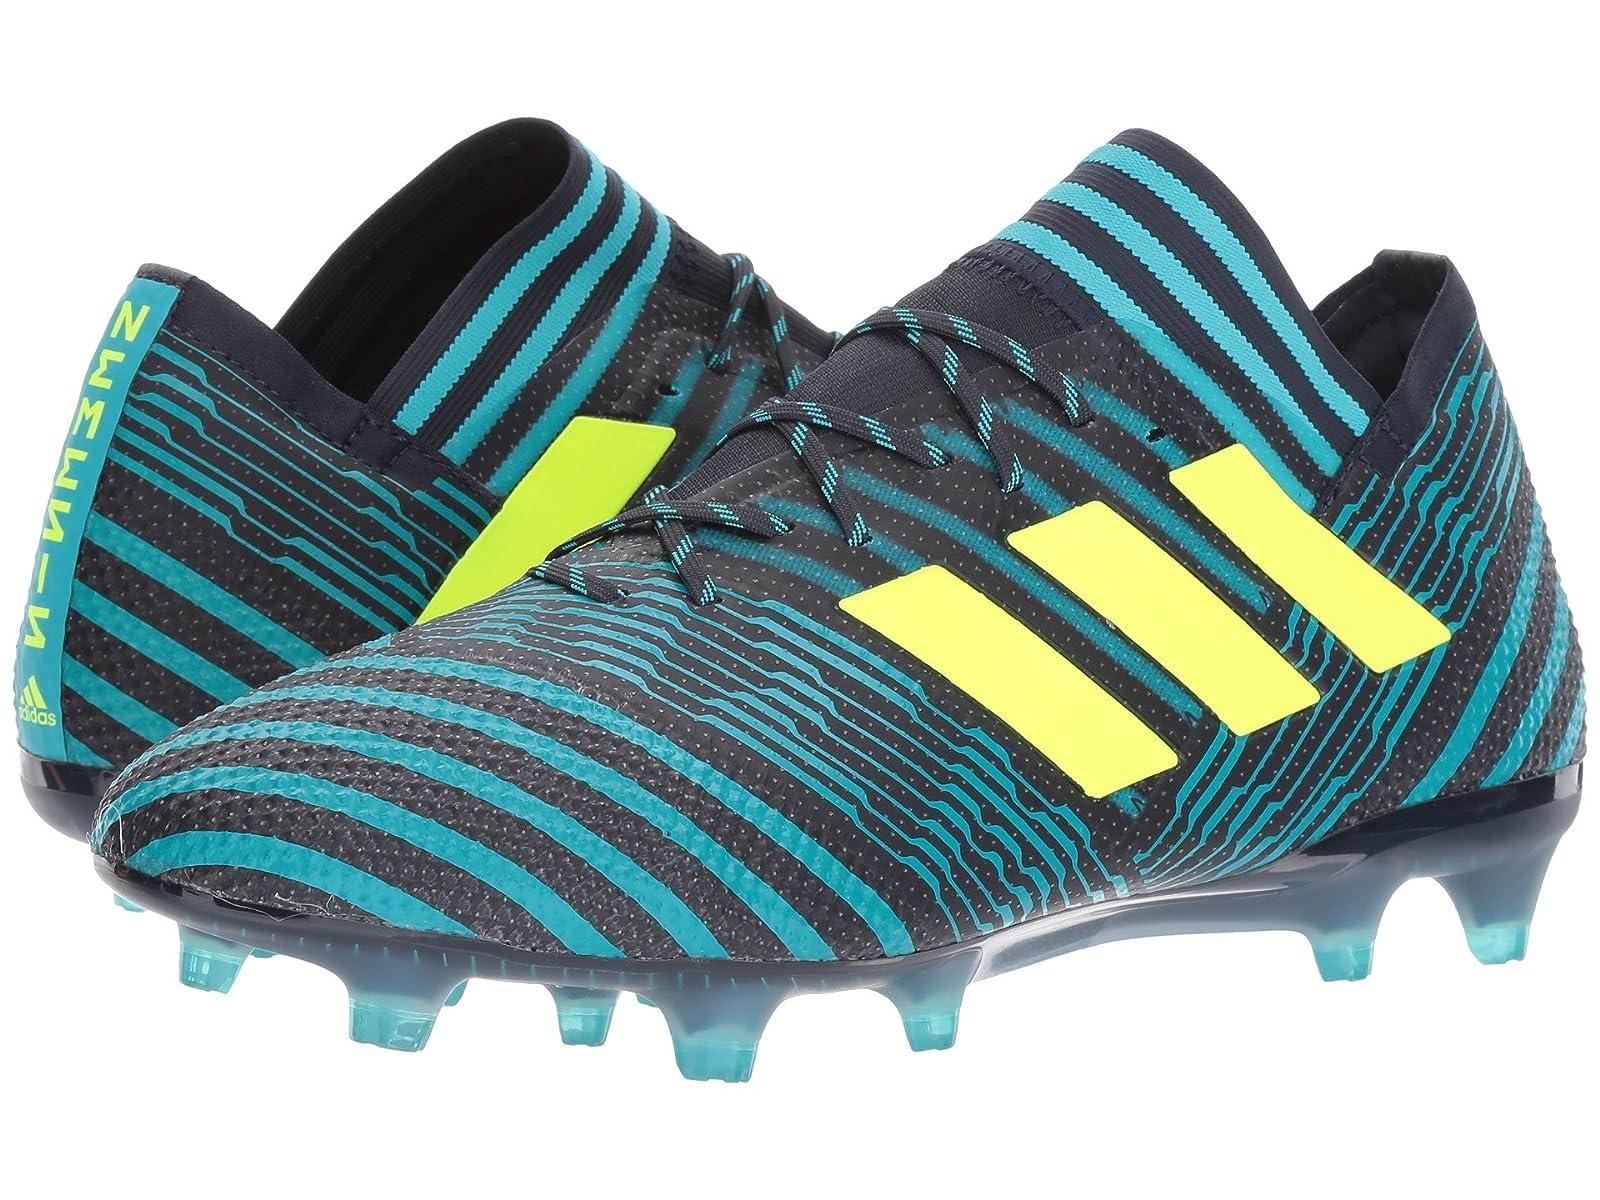 adidas Nemeziz 17.1 Firm Ground CleatsStylish and characteristic shoes